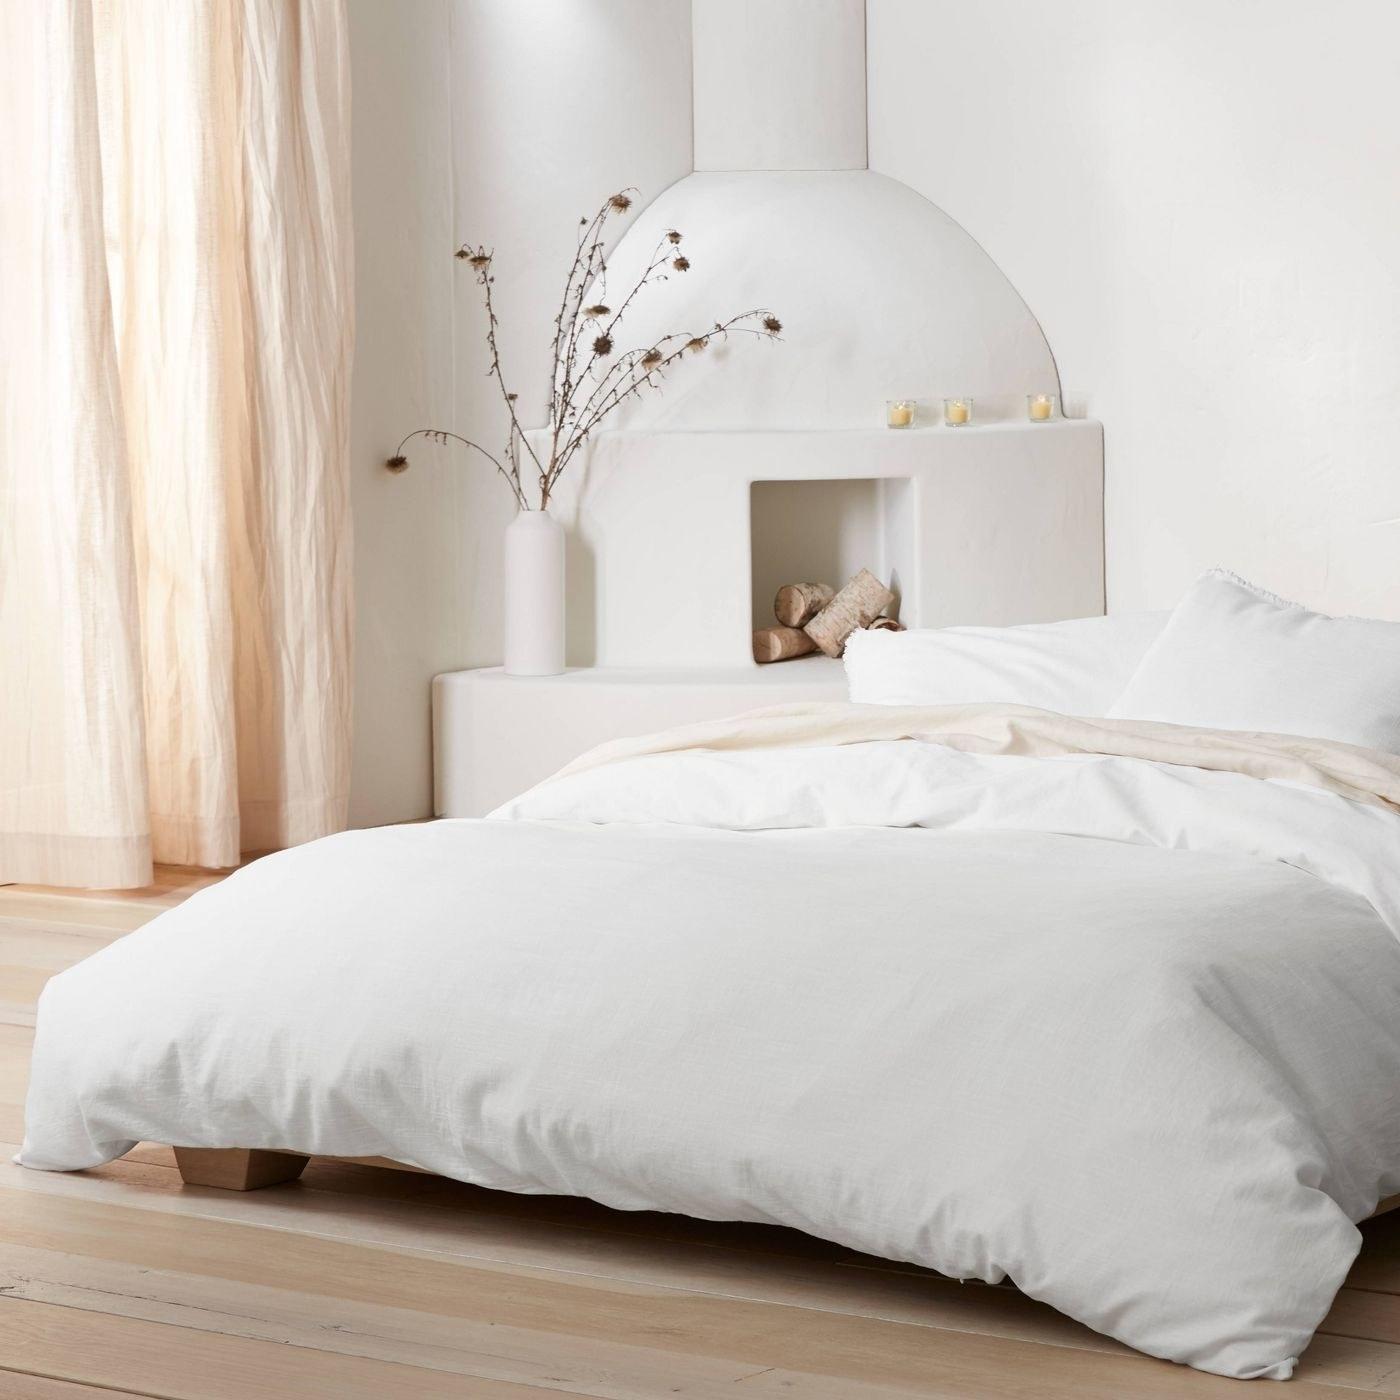 A white duvet and sham set in a white decor bedroom